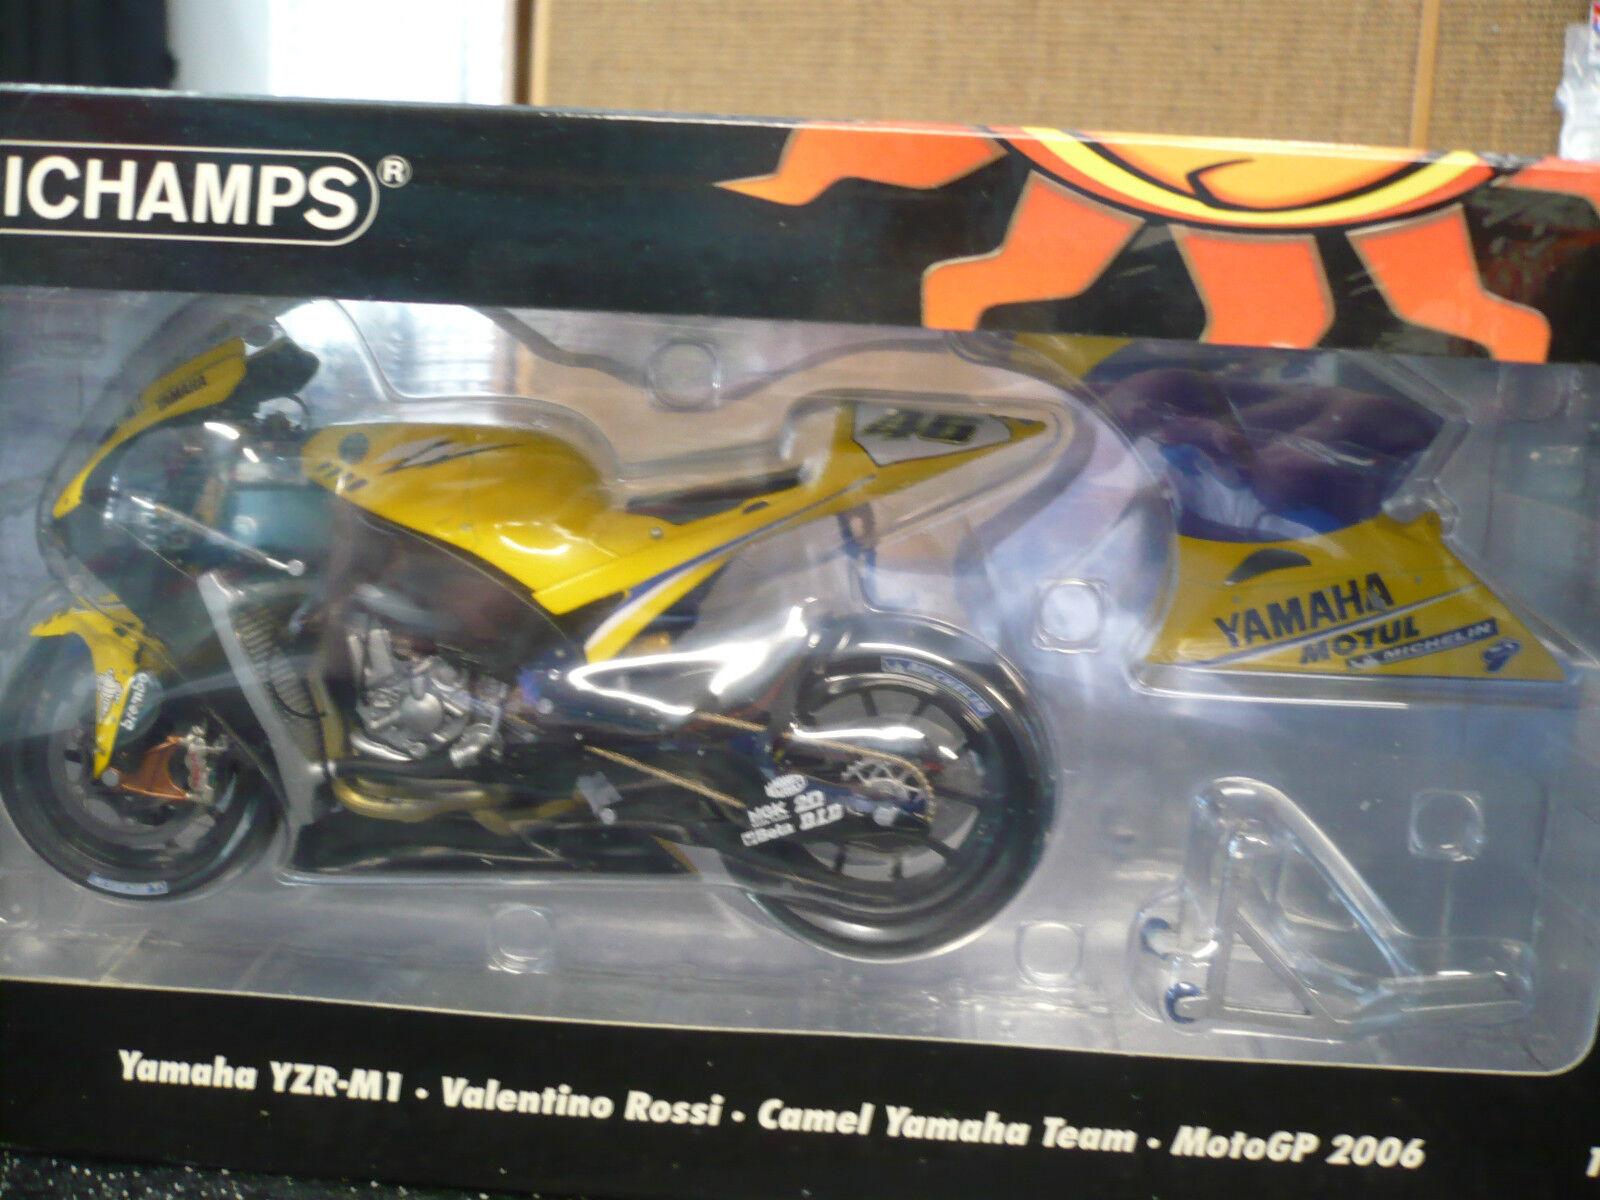 1 12 Valentino Rossi 2006 MotoGP Yamaha YZR-M1 Camel Yamaha Team Minichamps